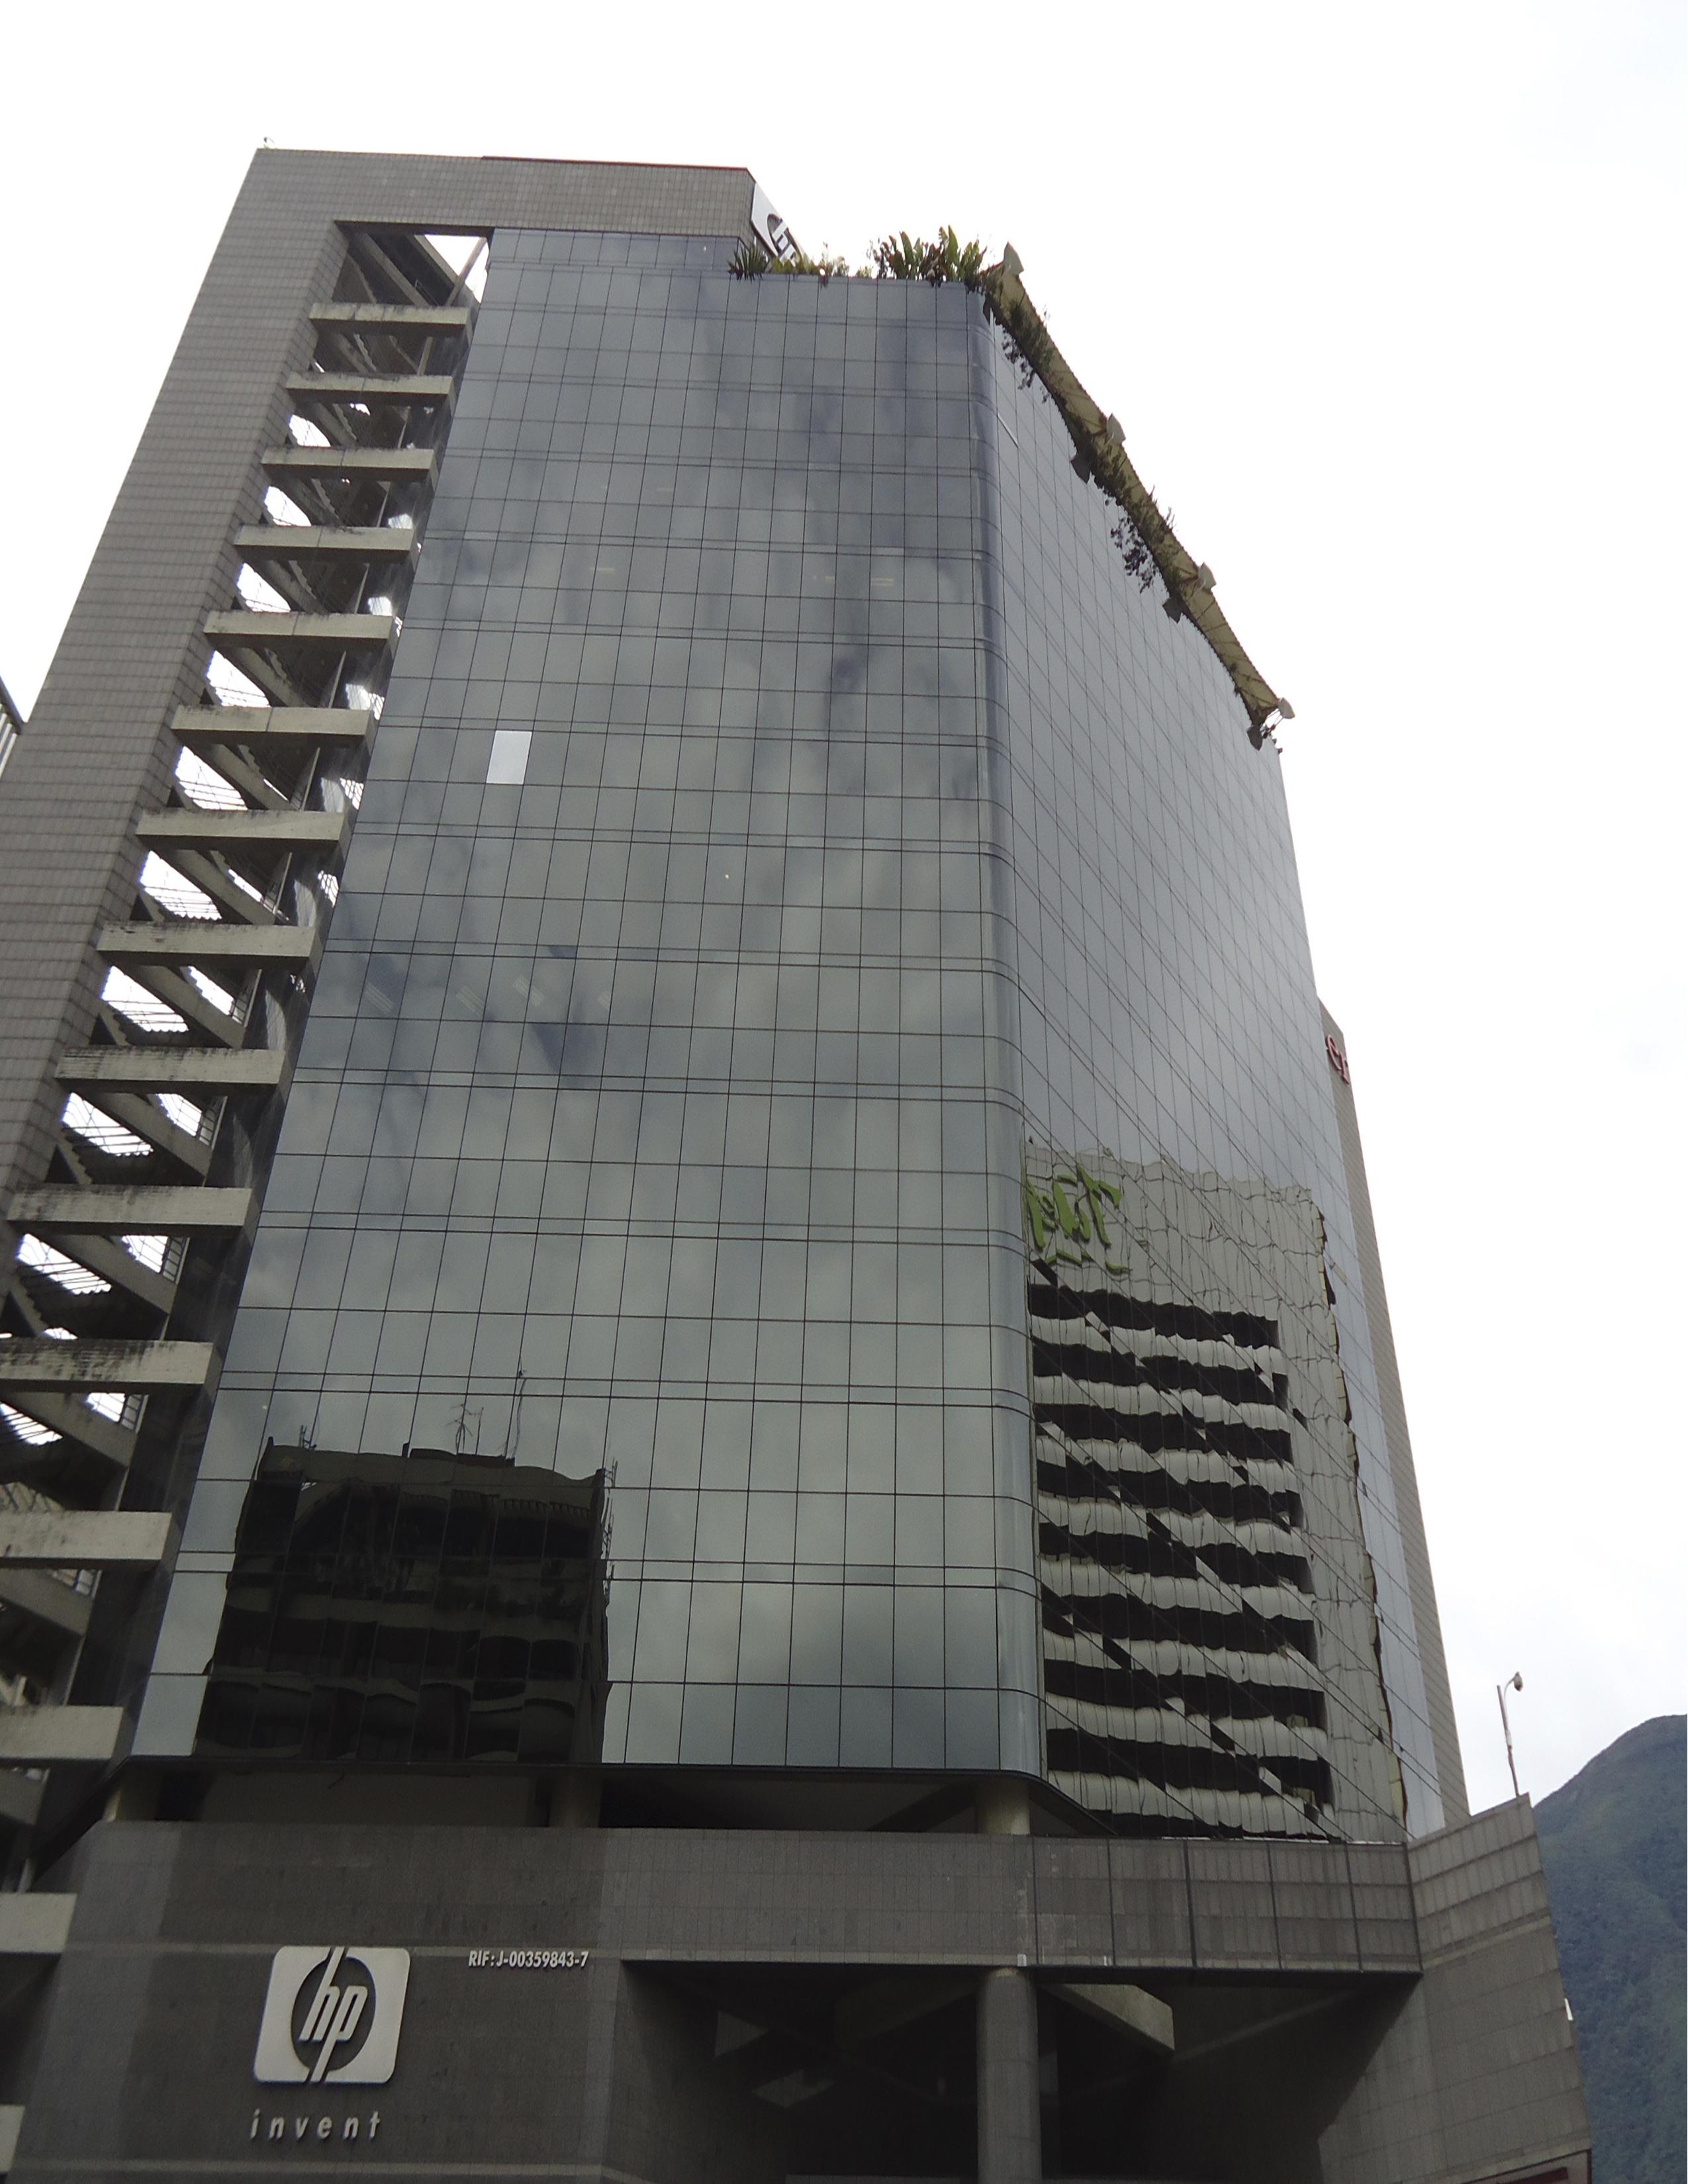 Torre Hewlett-Packard